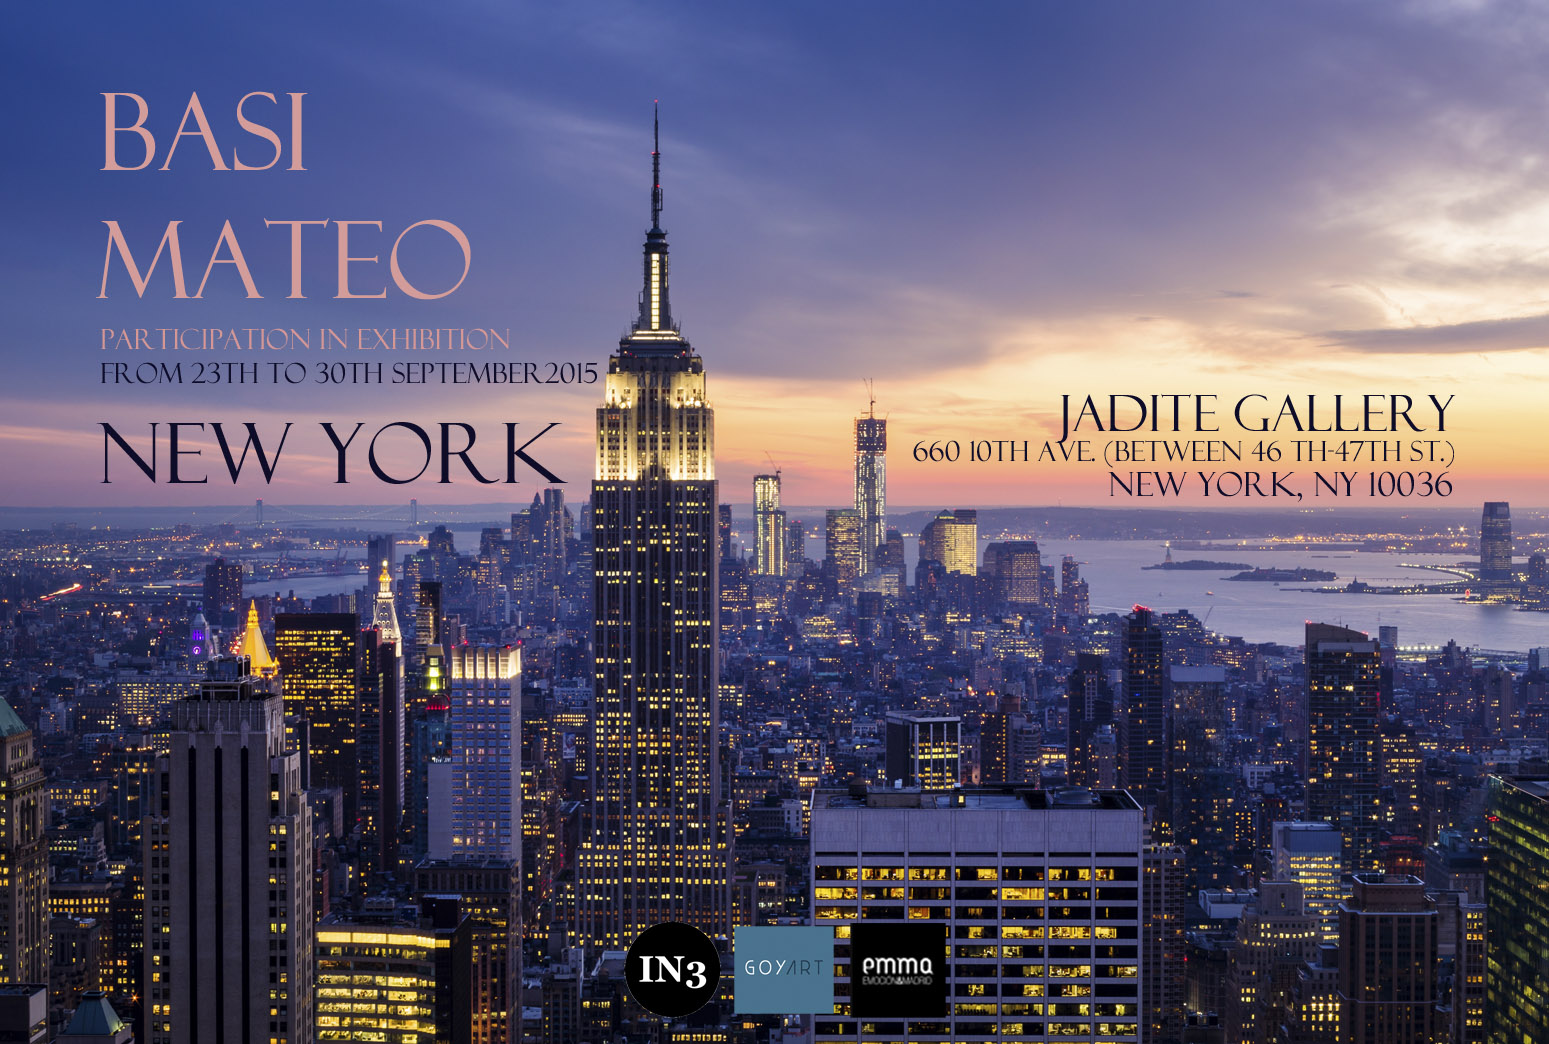 Colectiva NEW YORK